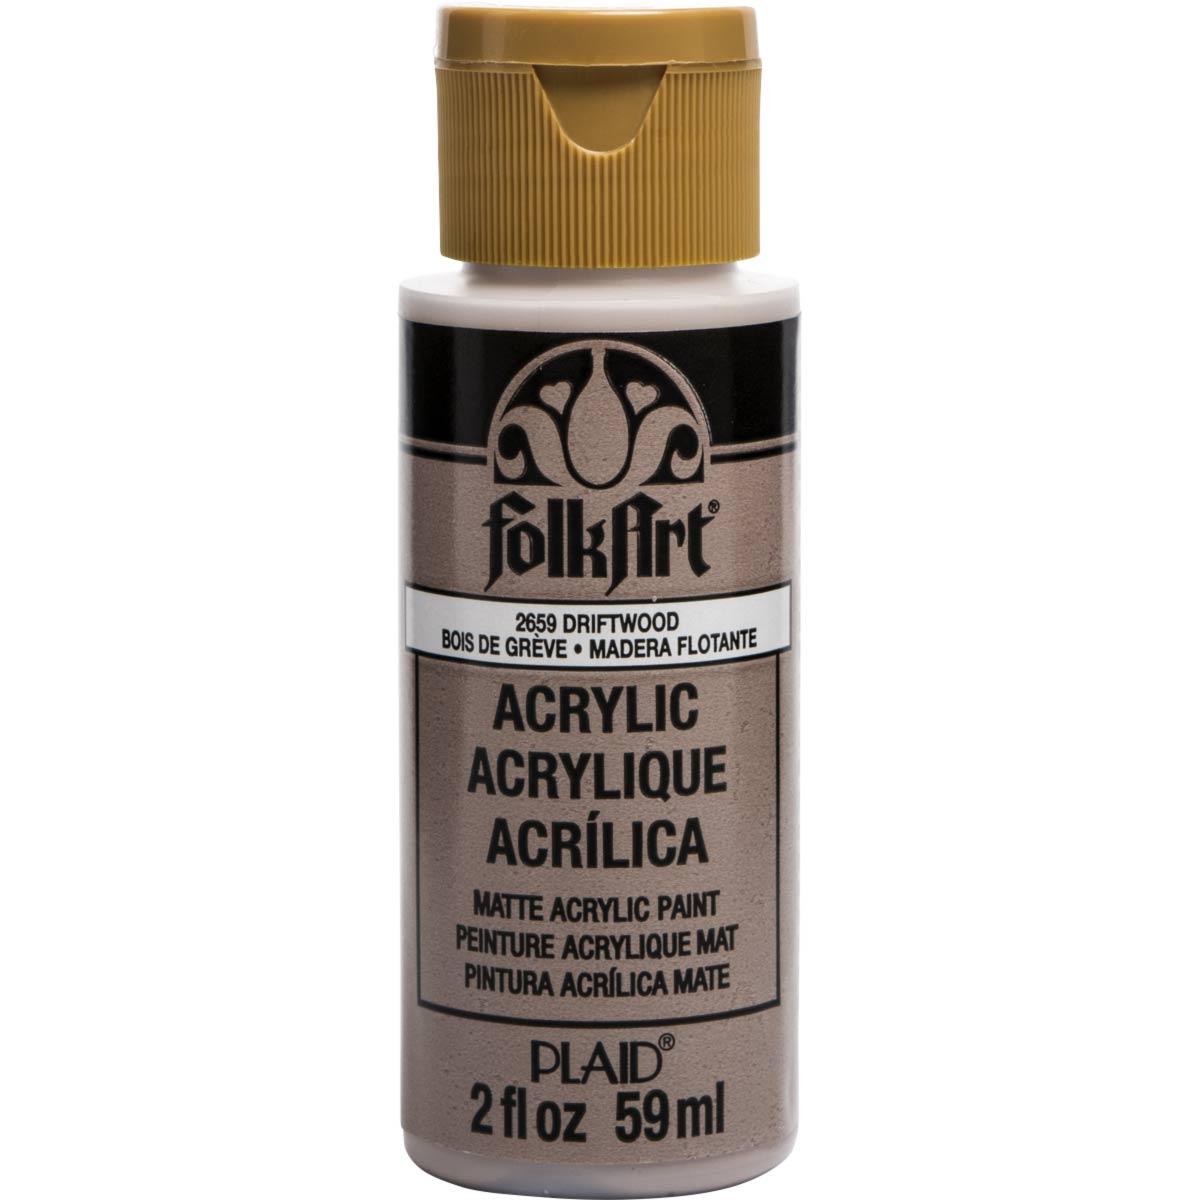 FolkArt ® Acrylic Colors - Driftwood, 2 oz.